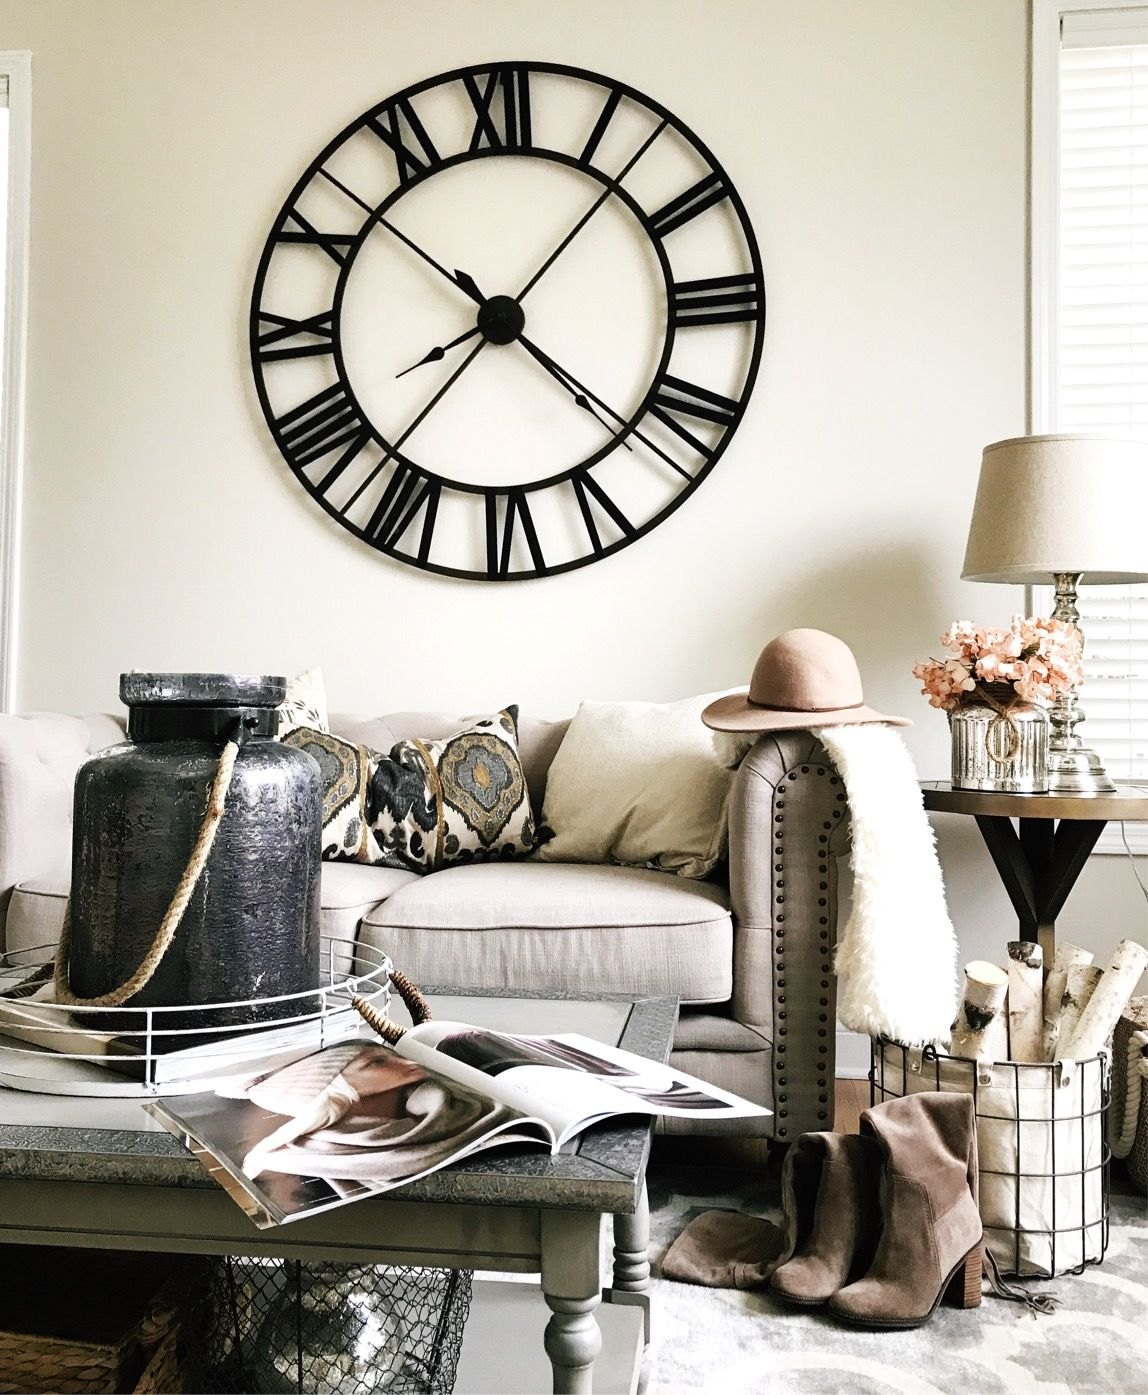 Rustic Farmhouse Decor Living Room Decor Ideas Large Wall Clock